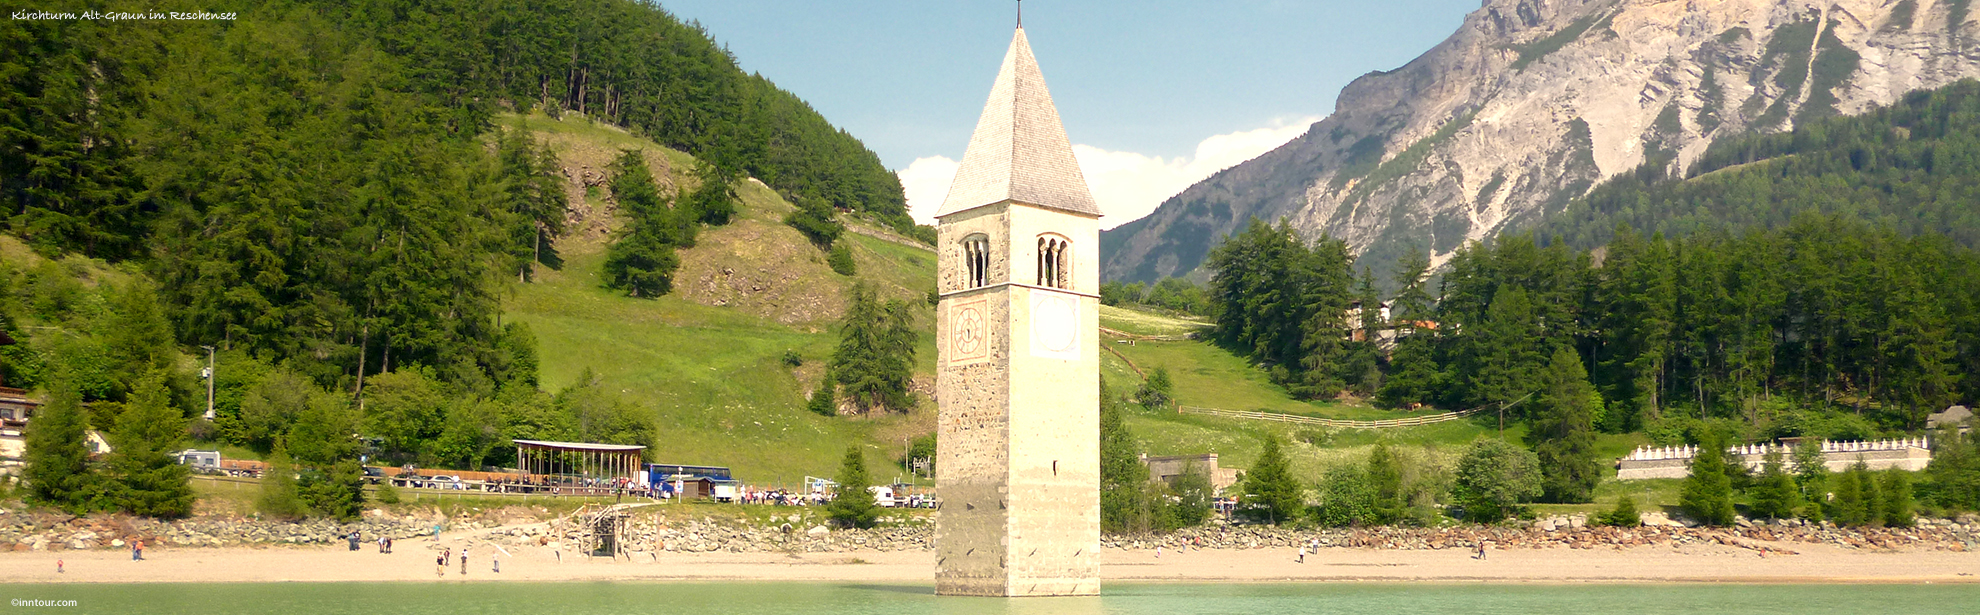 Oklassinntour_Alt-Graun-im-Reschensee_P1010596-2